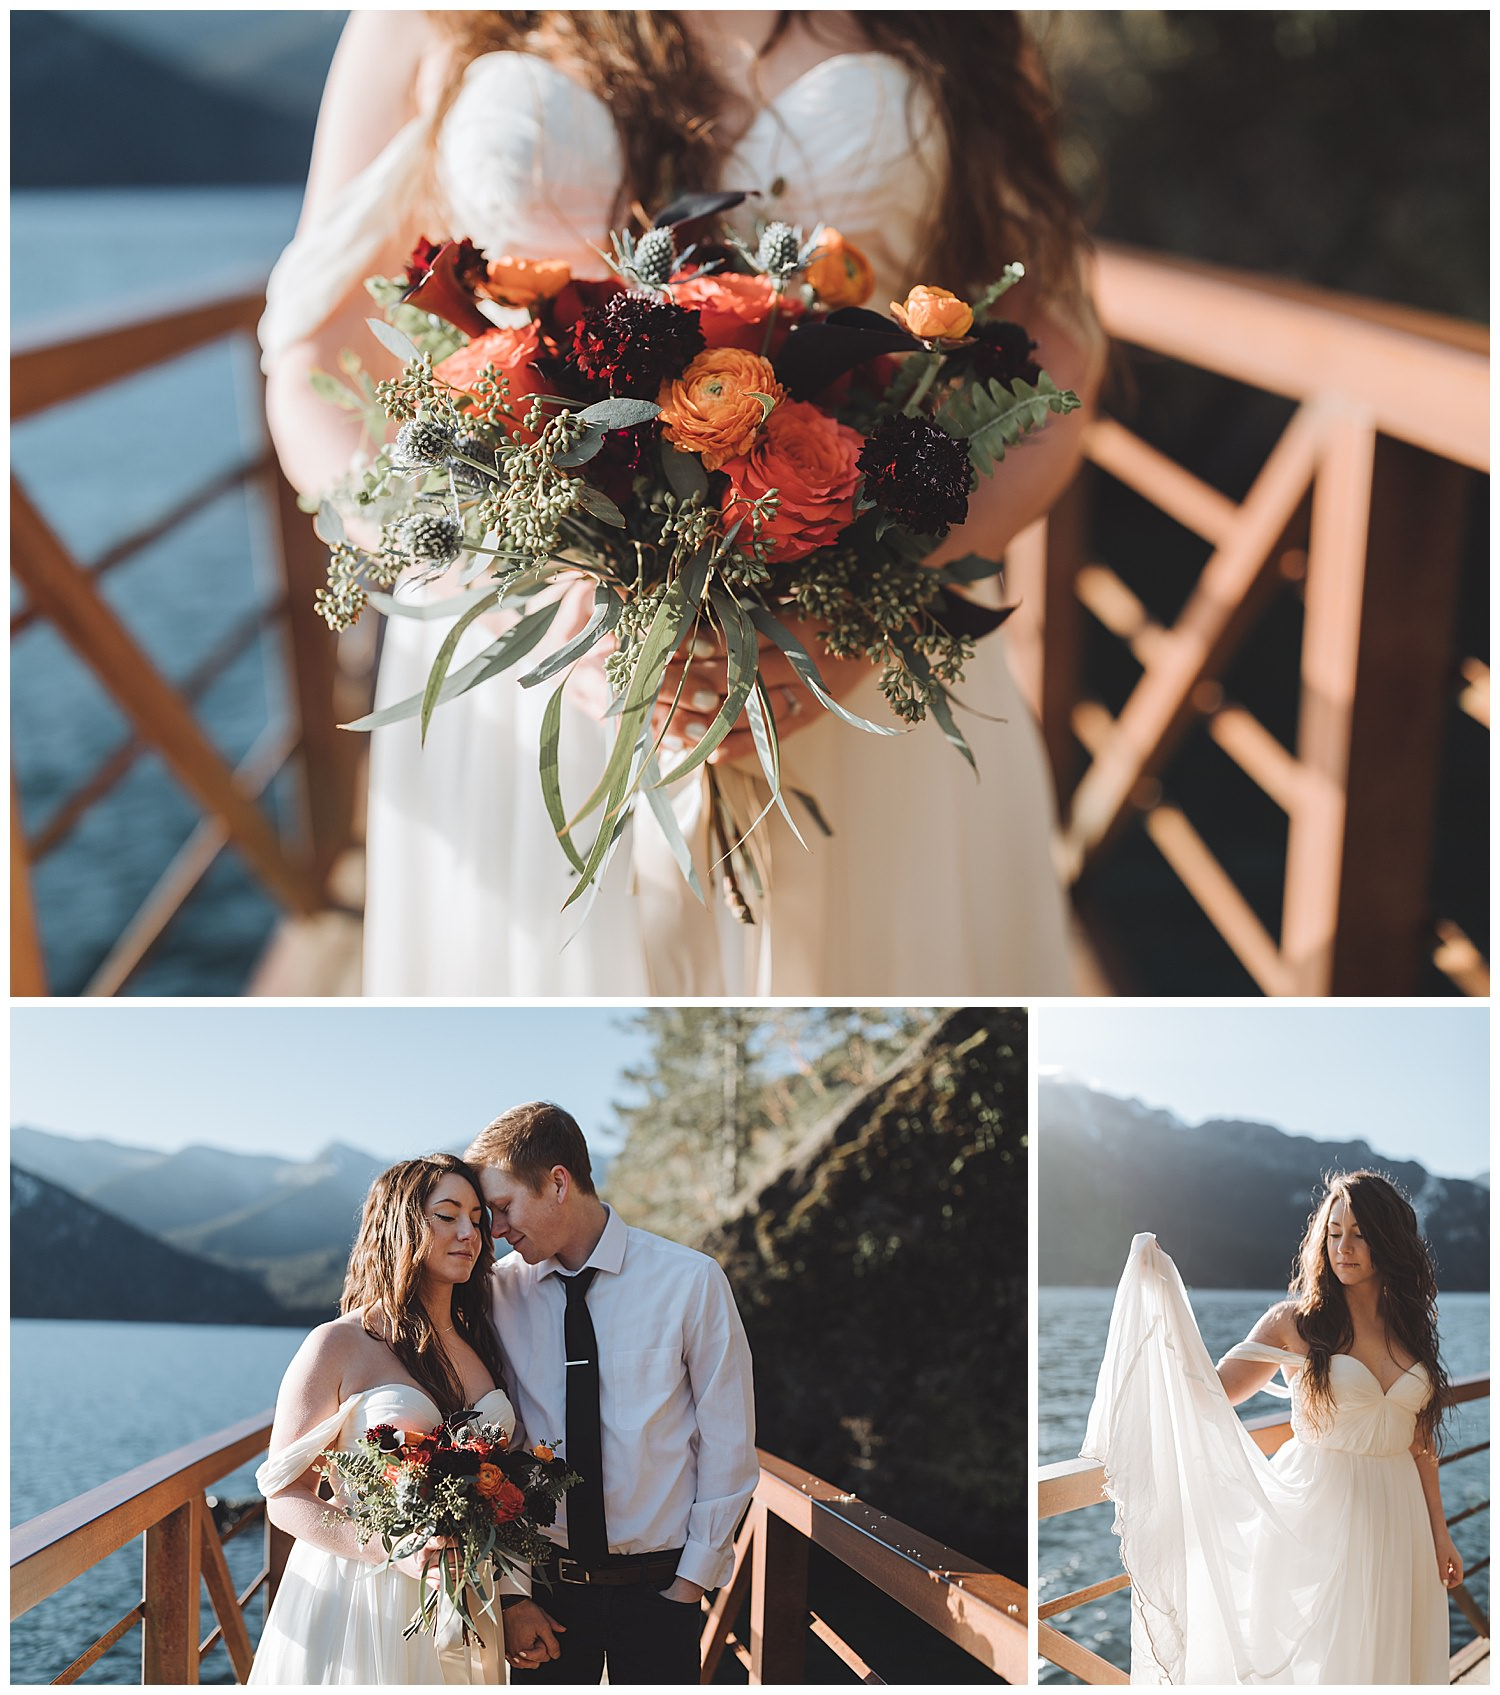 Lake-crescent-elopement_Stephanie-Keegan-Photography_11.jpg